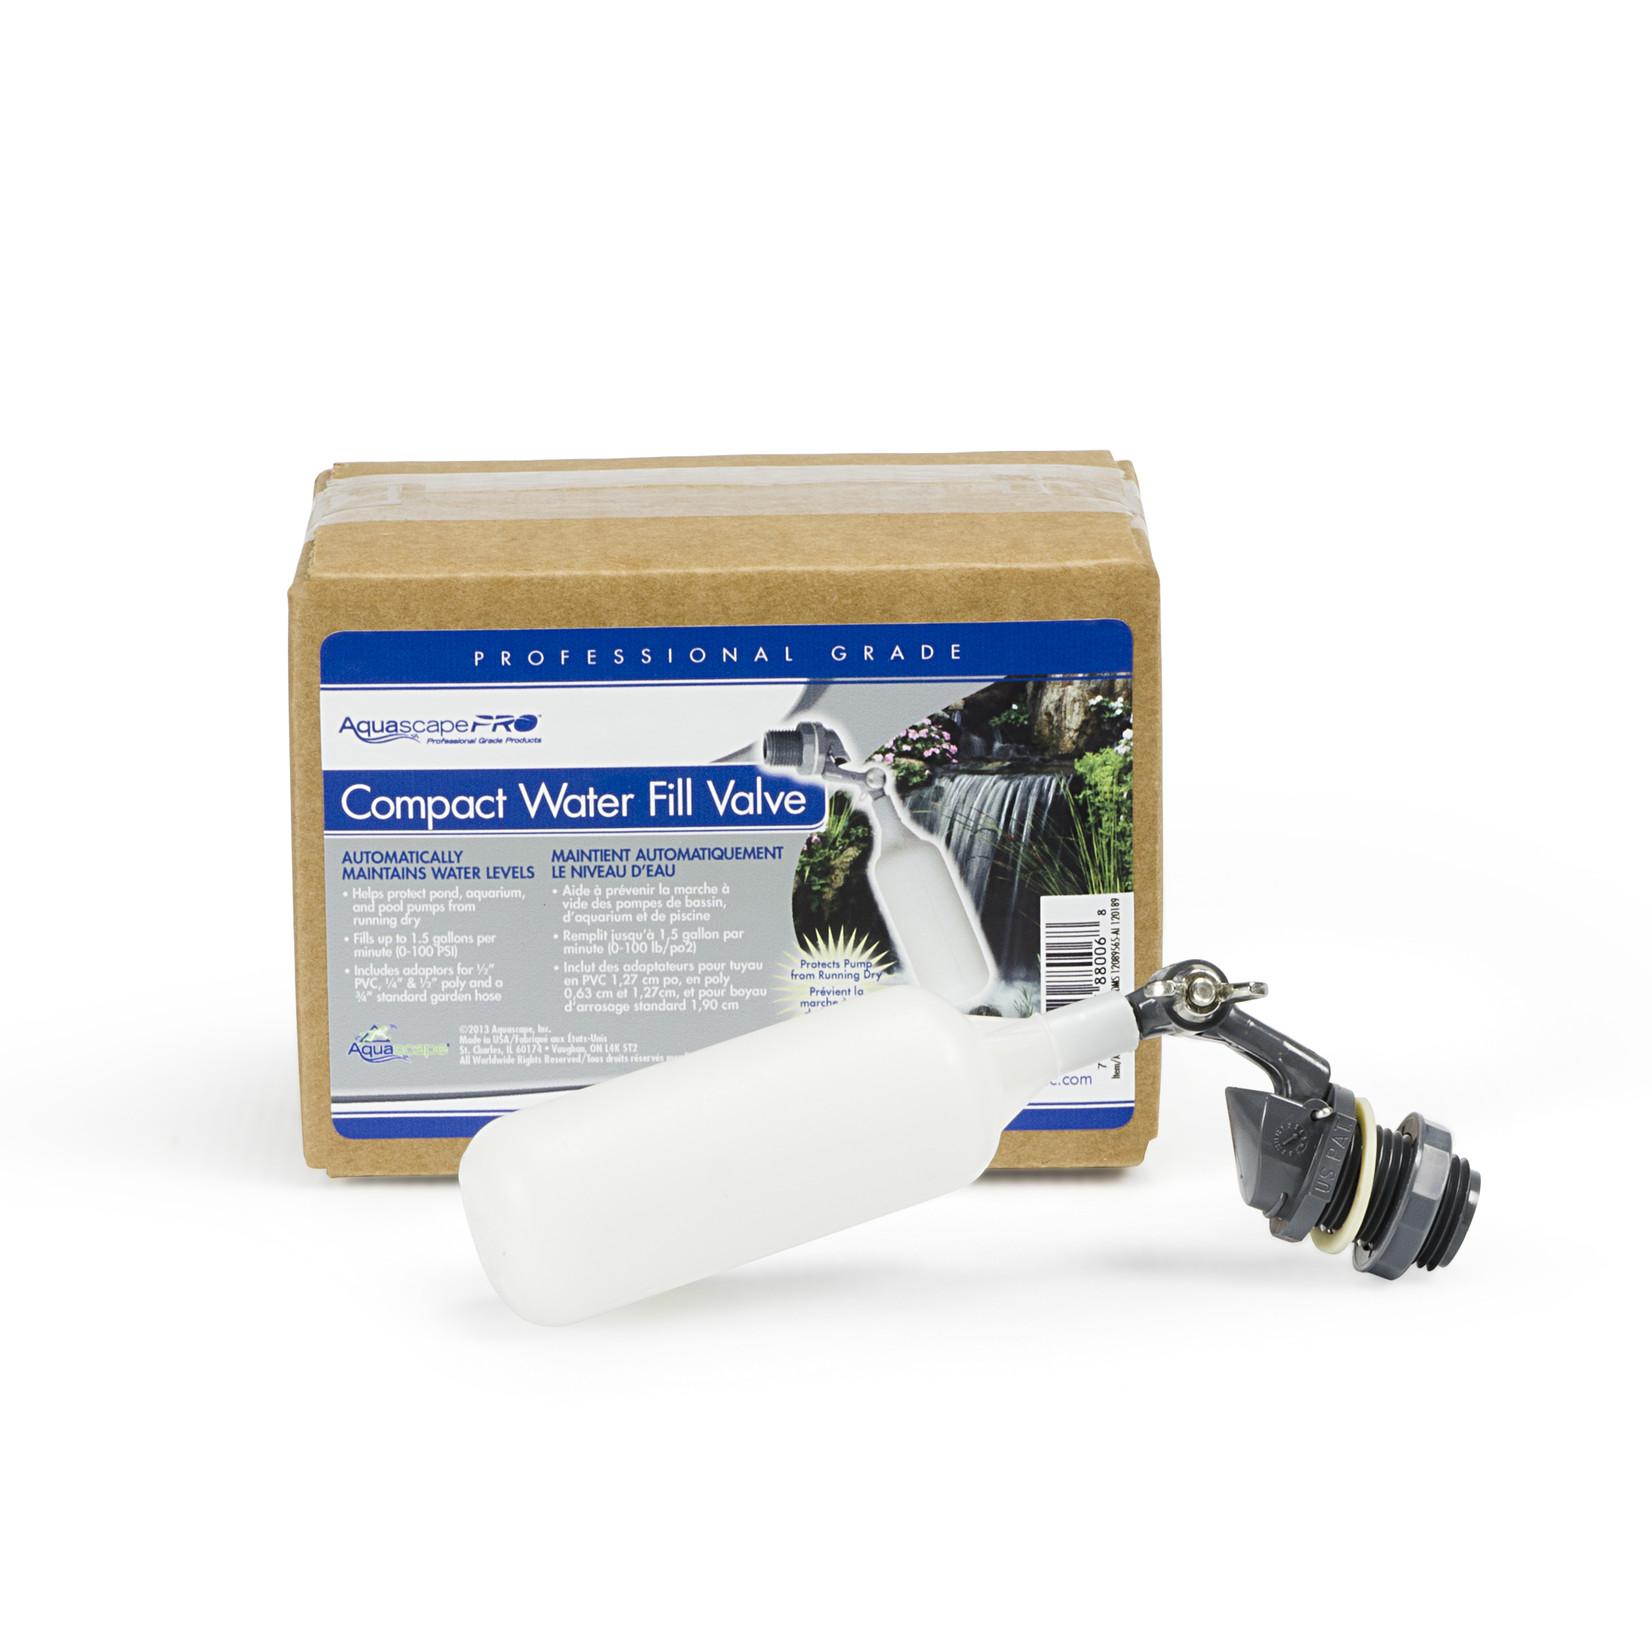 Aquascape Compact Water Fill Valve